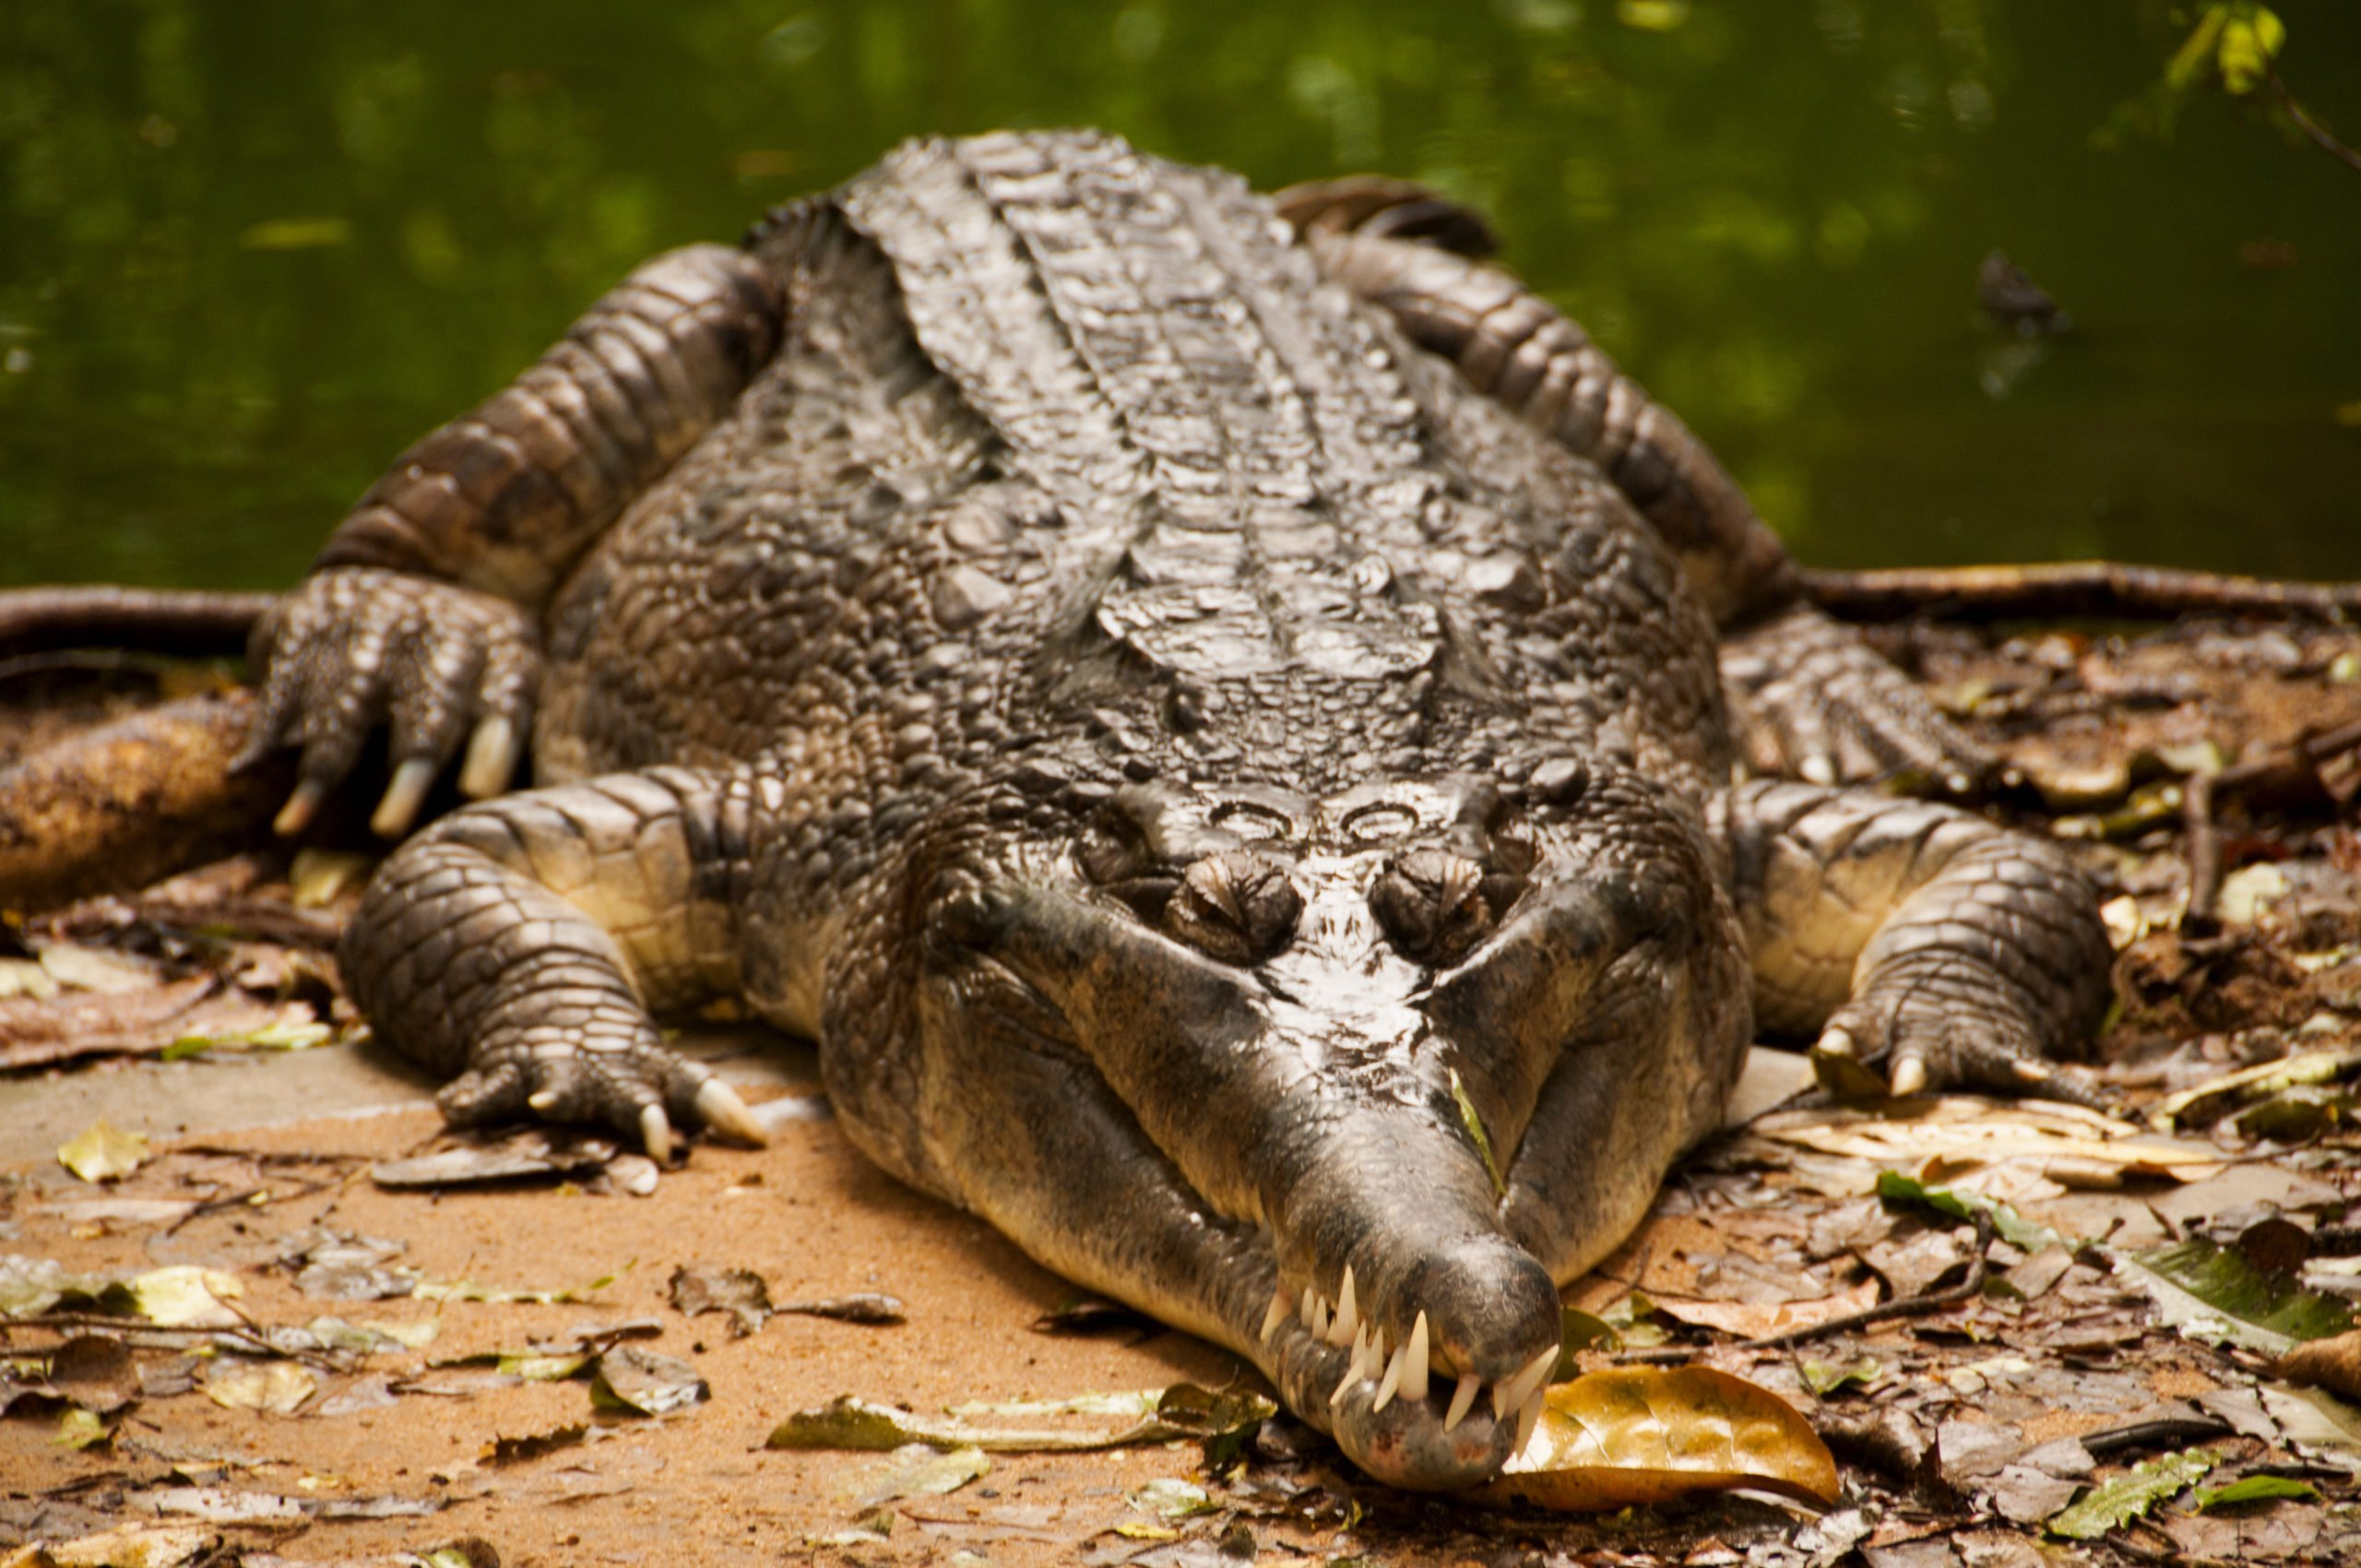 Meet More Than 2500 Reptiles At Chennai Crocodile Park In Our Wildlife Tour In Chennai